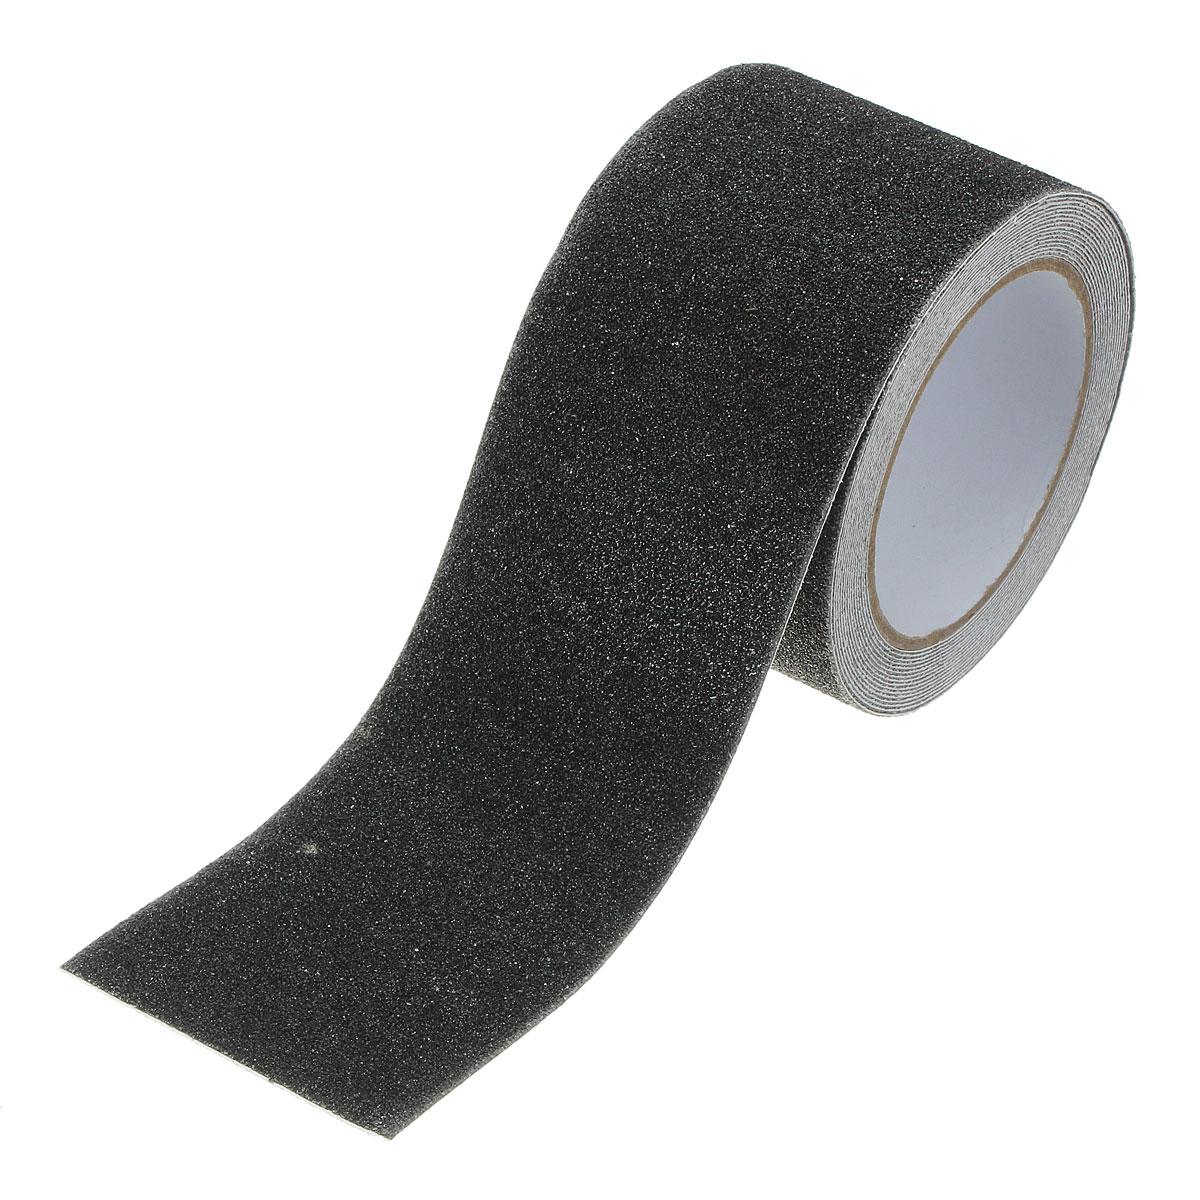 Anti Slip Floor Grips : Anti slip non skid tape high grip self adhesive black